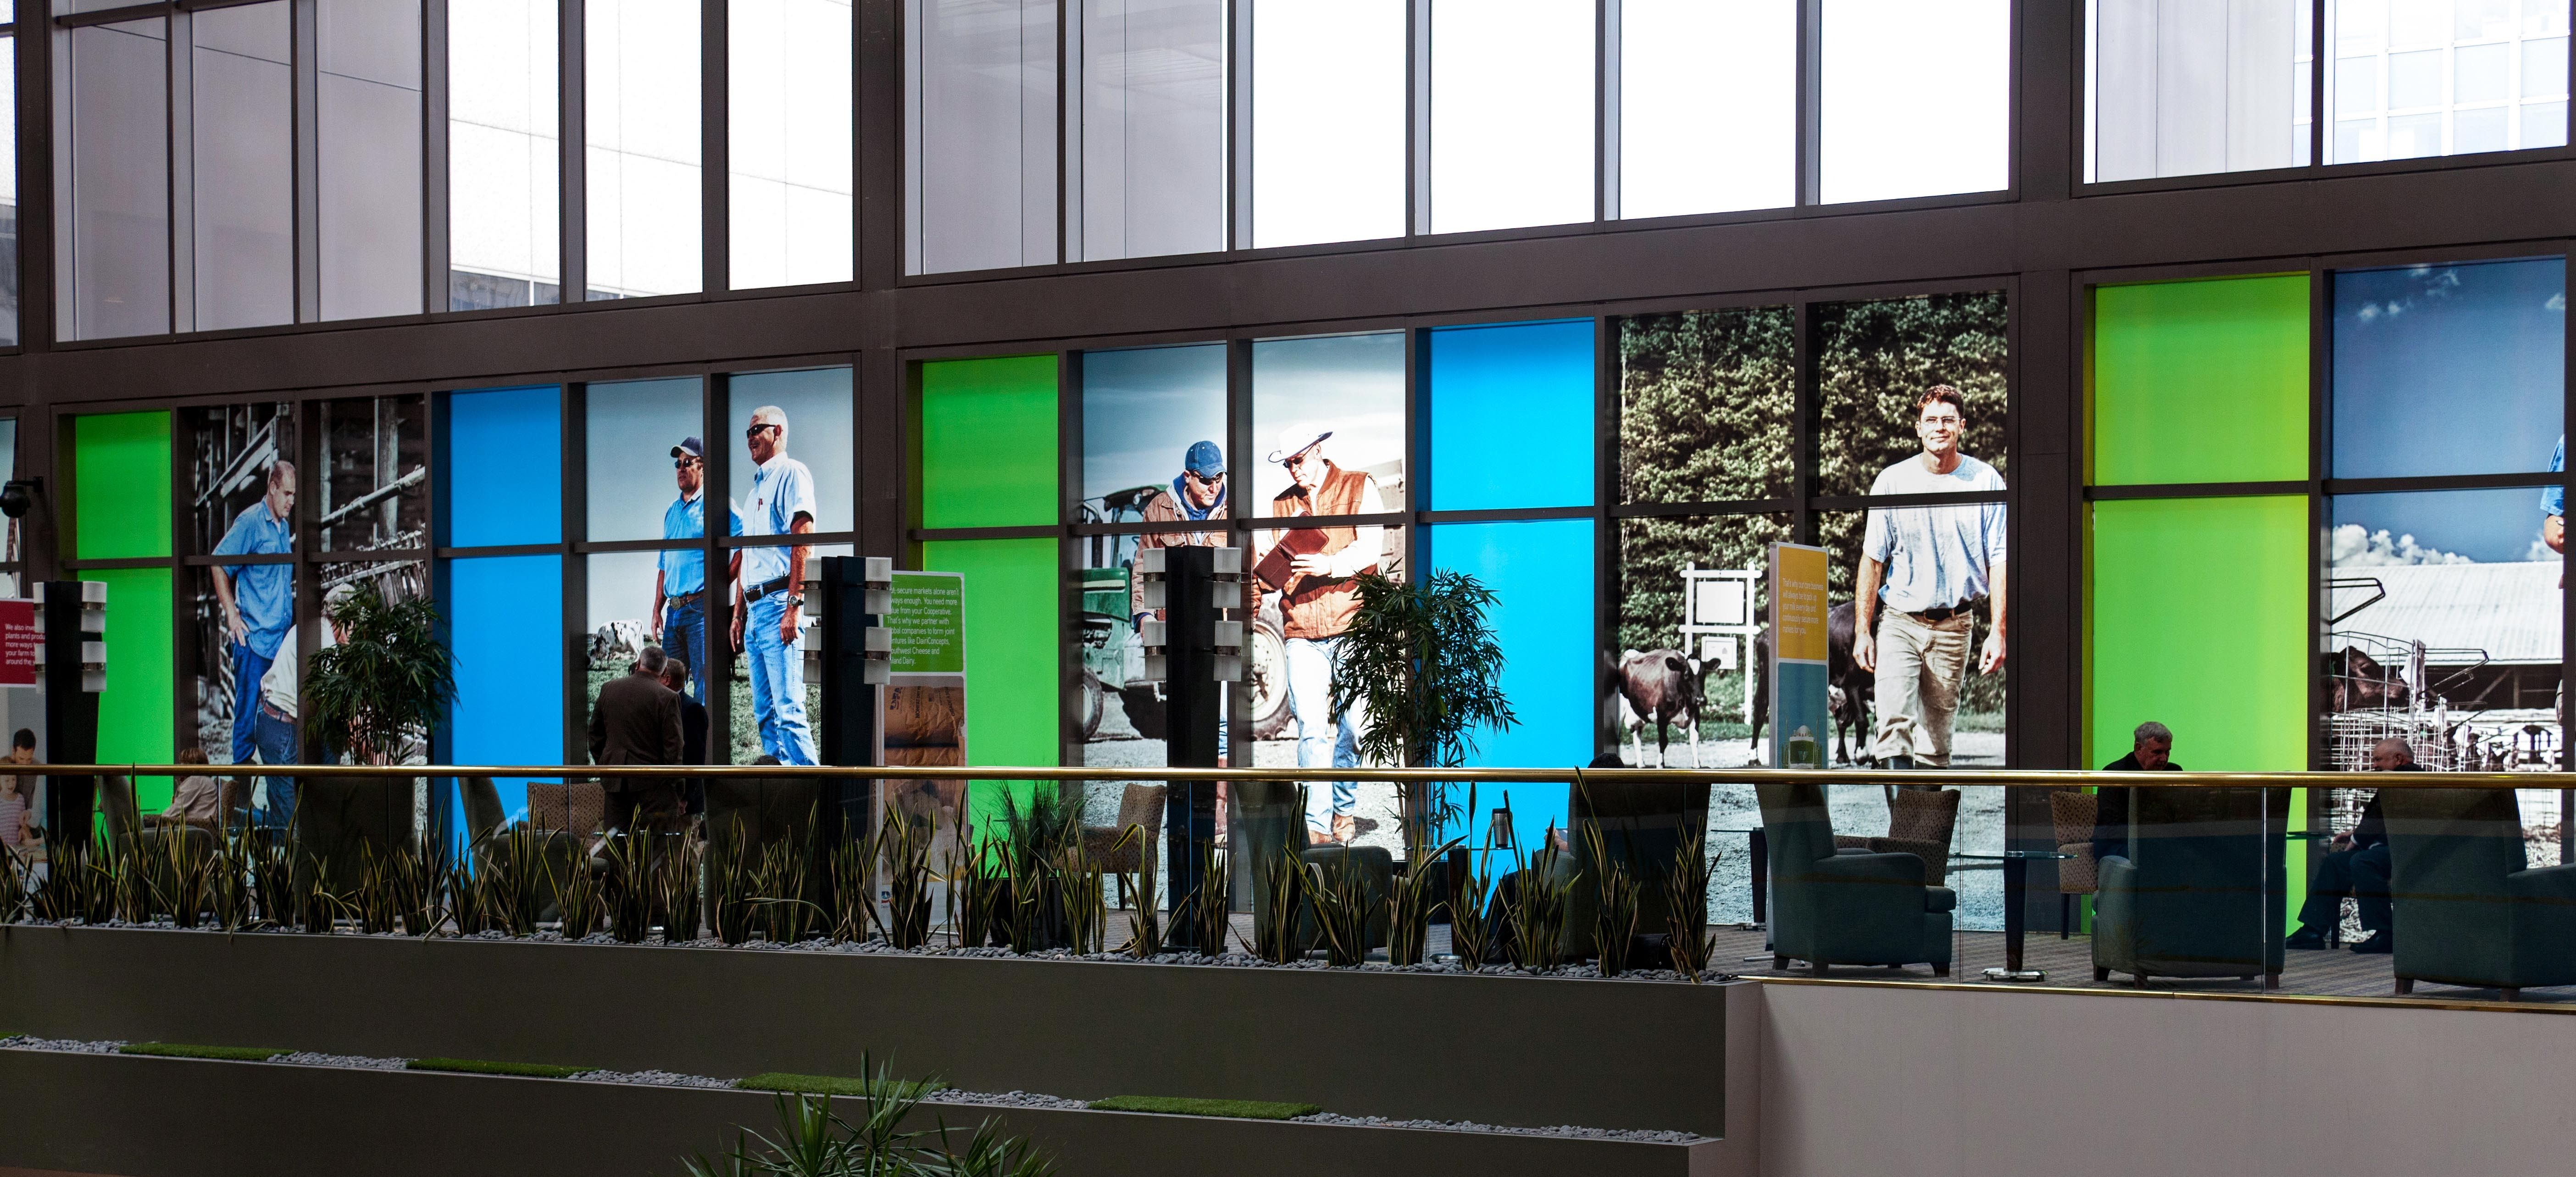 DFA Hotel Window Graphics